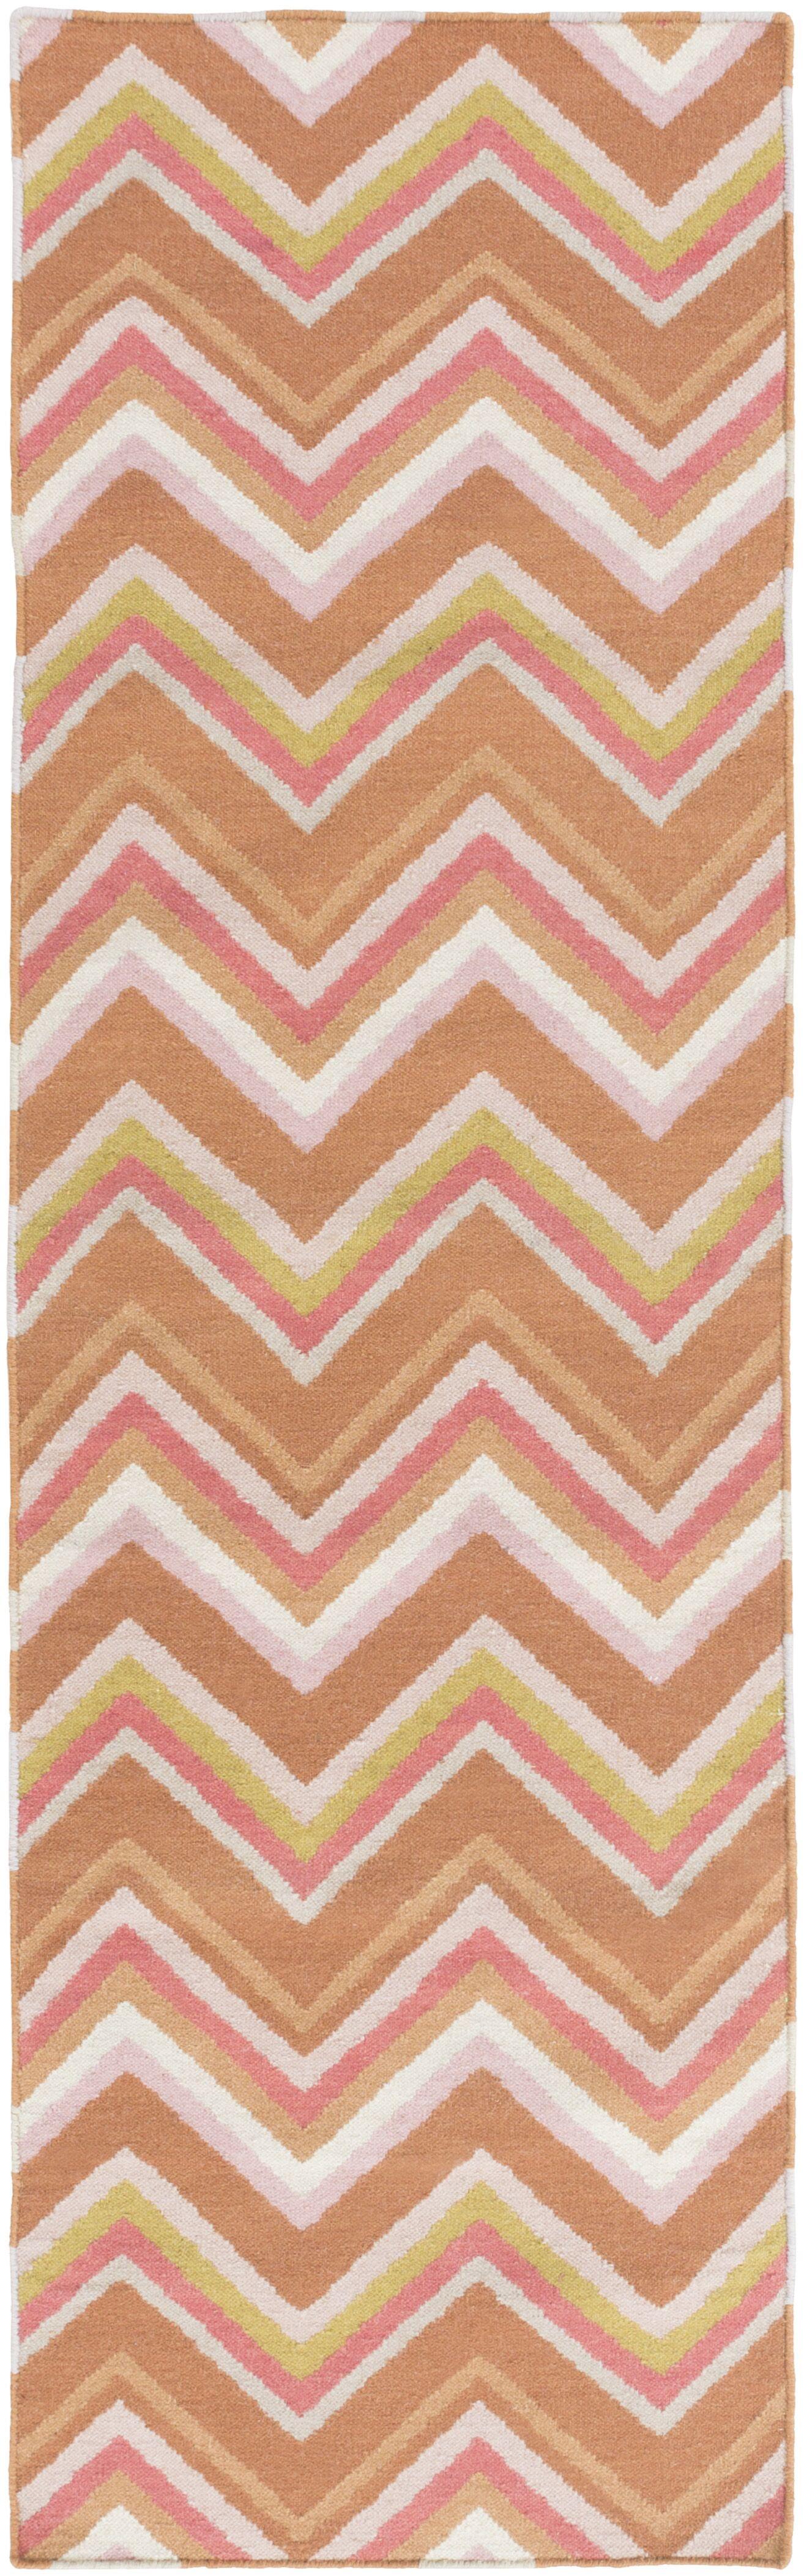 Diego Chevron Wool Area Rug Rug Size: Rectangle 5' x 8'